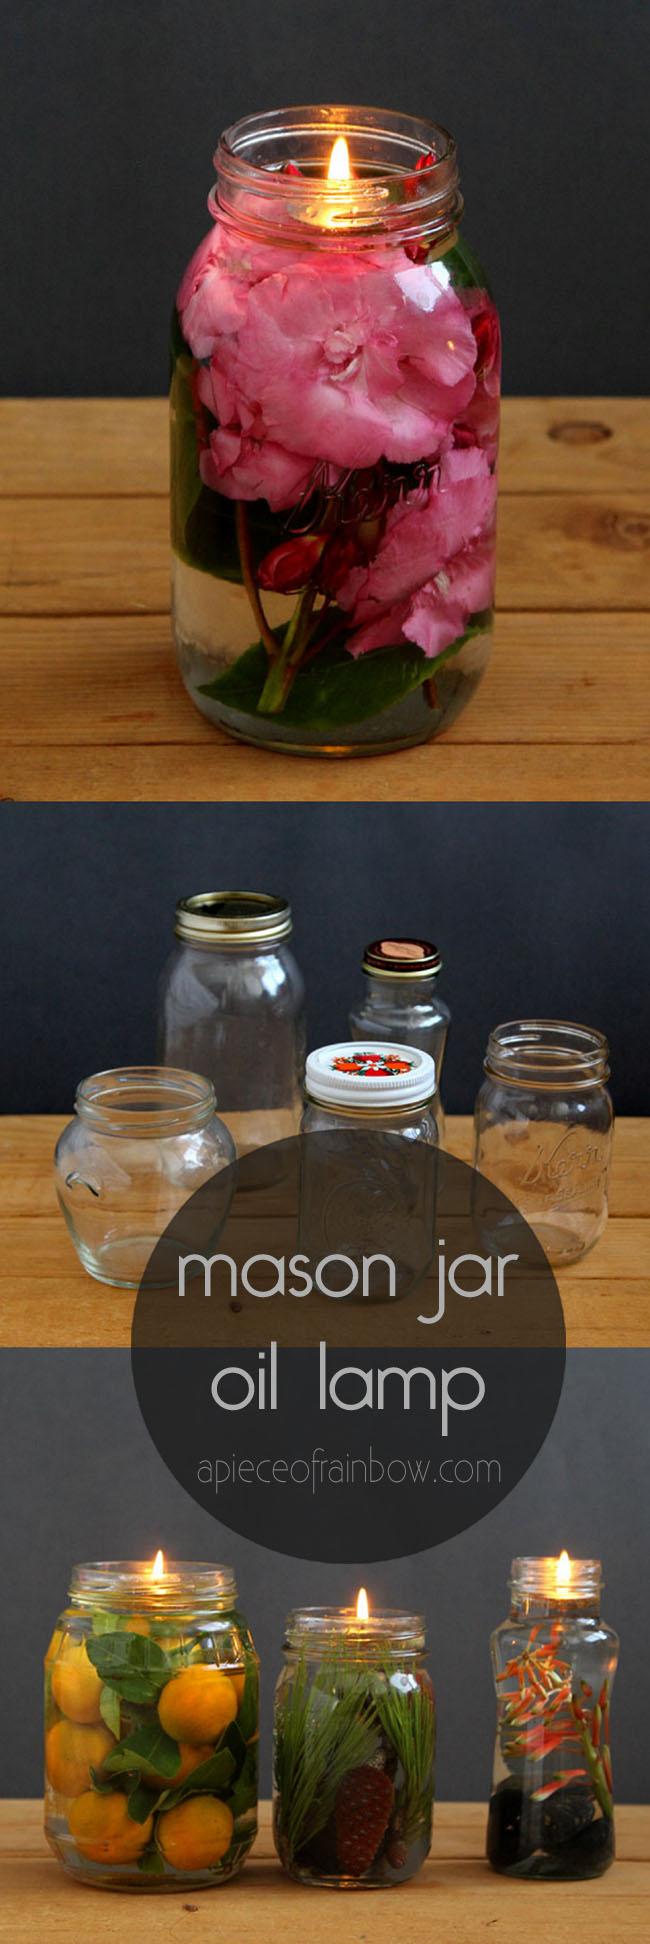 mason-jar-oil-lamp-diythought